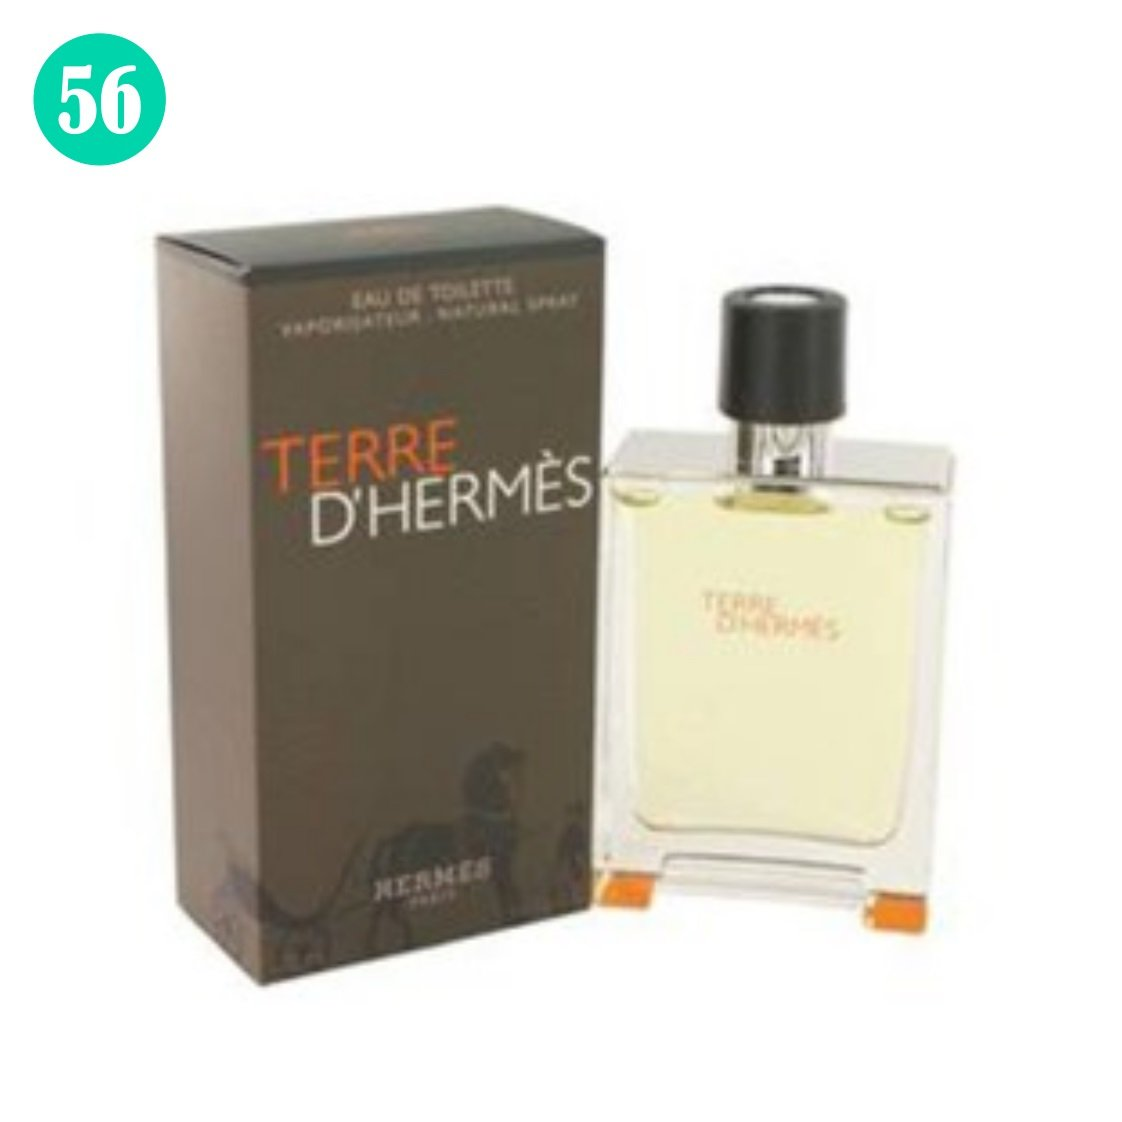 TERRE D'HERMÈS – Hermès uomo